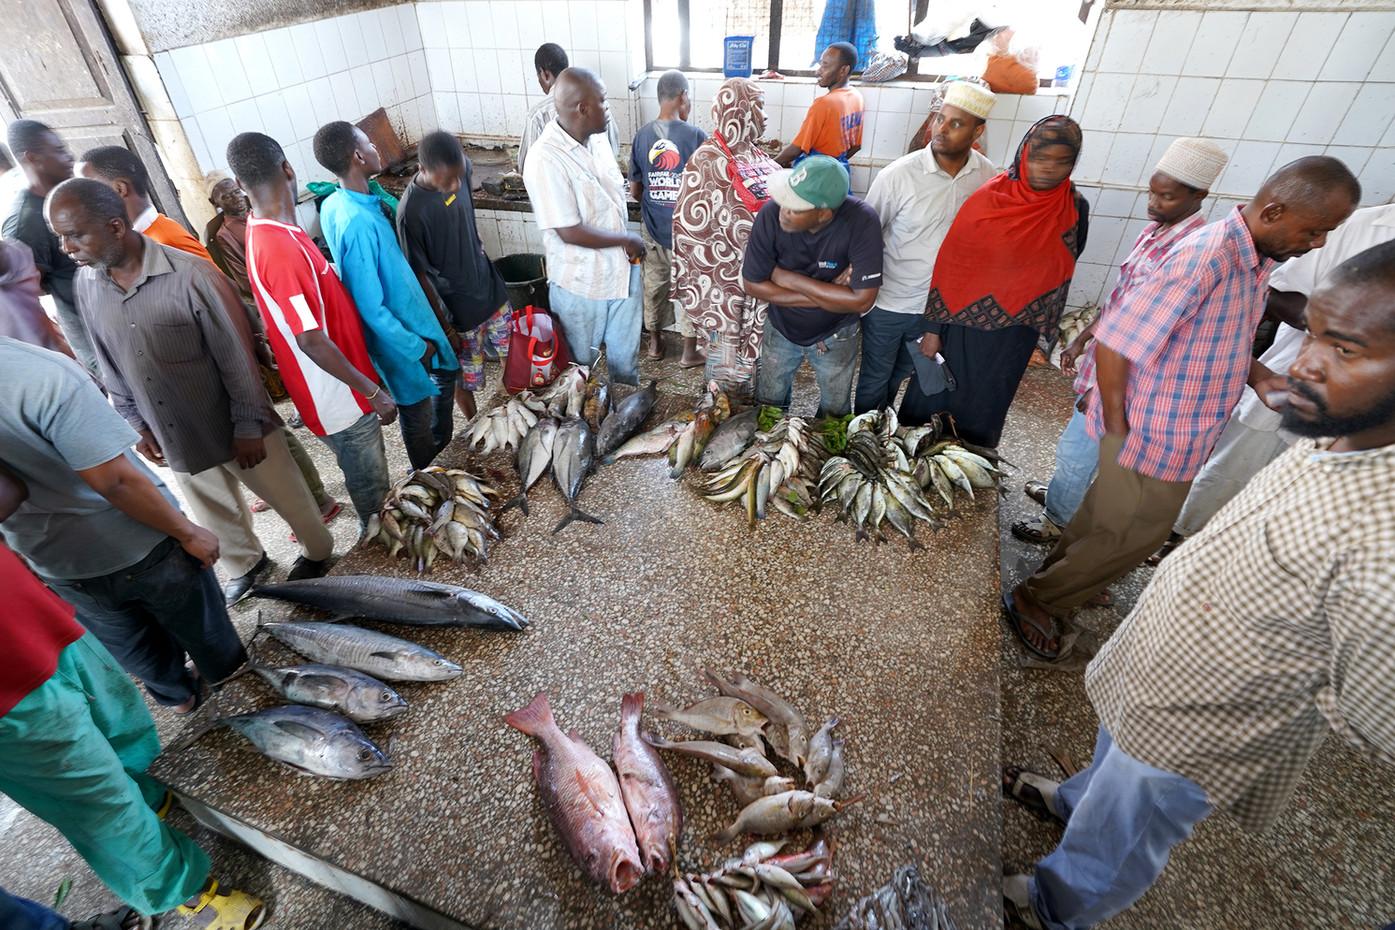 Zanzibar fish market, Tanzania